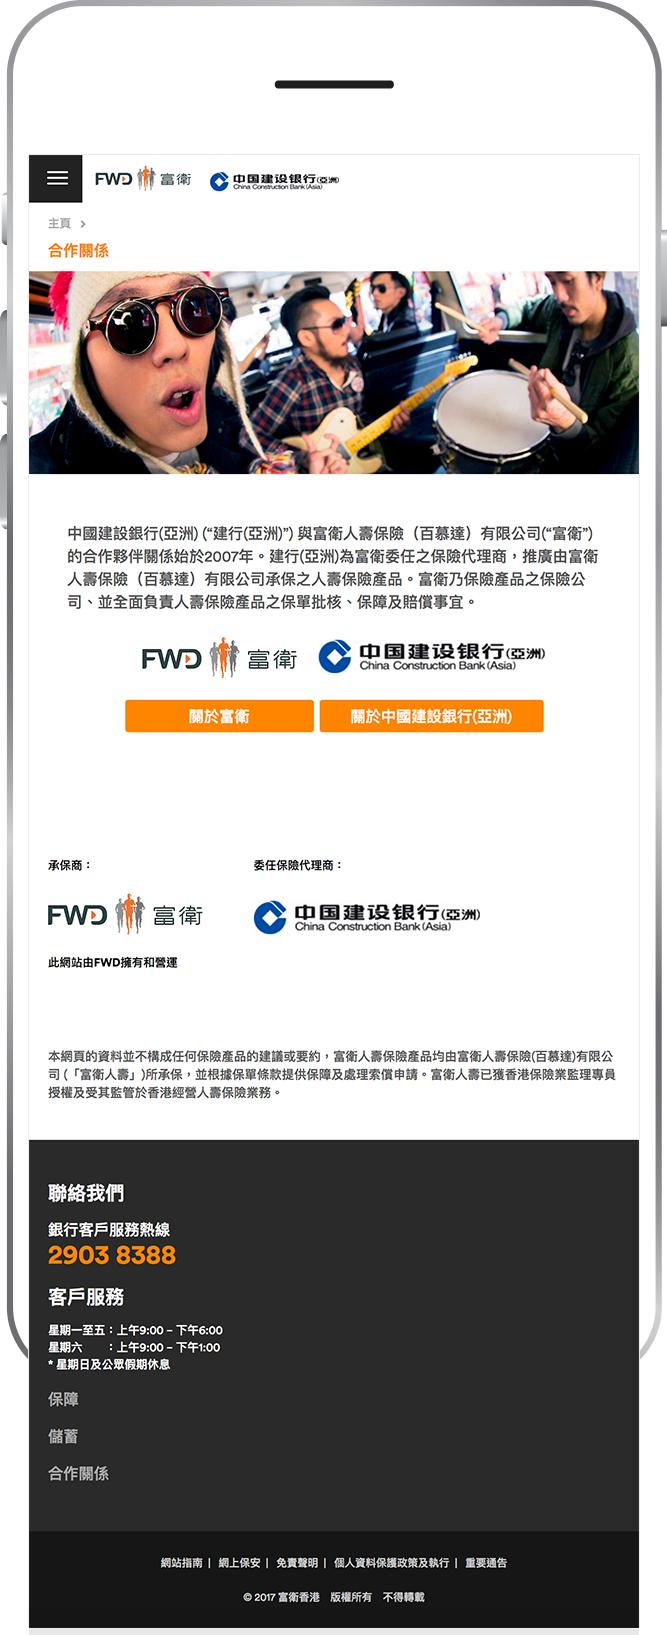 FWD PartnerC